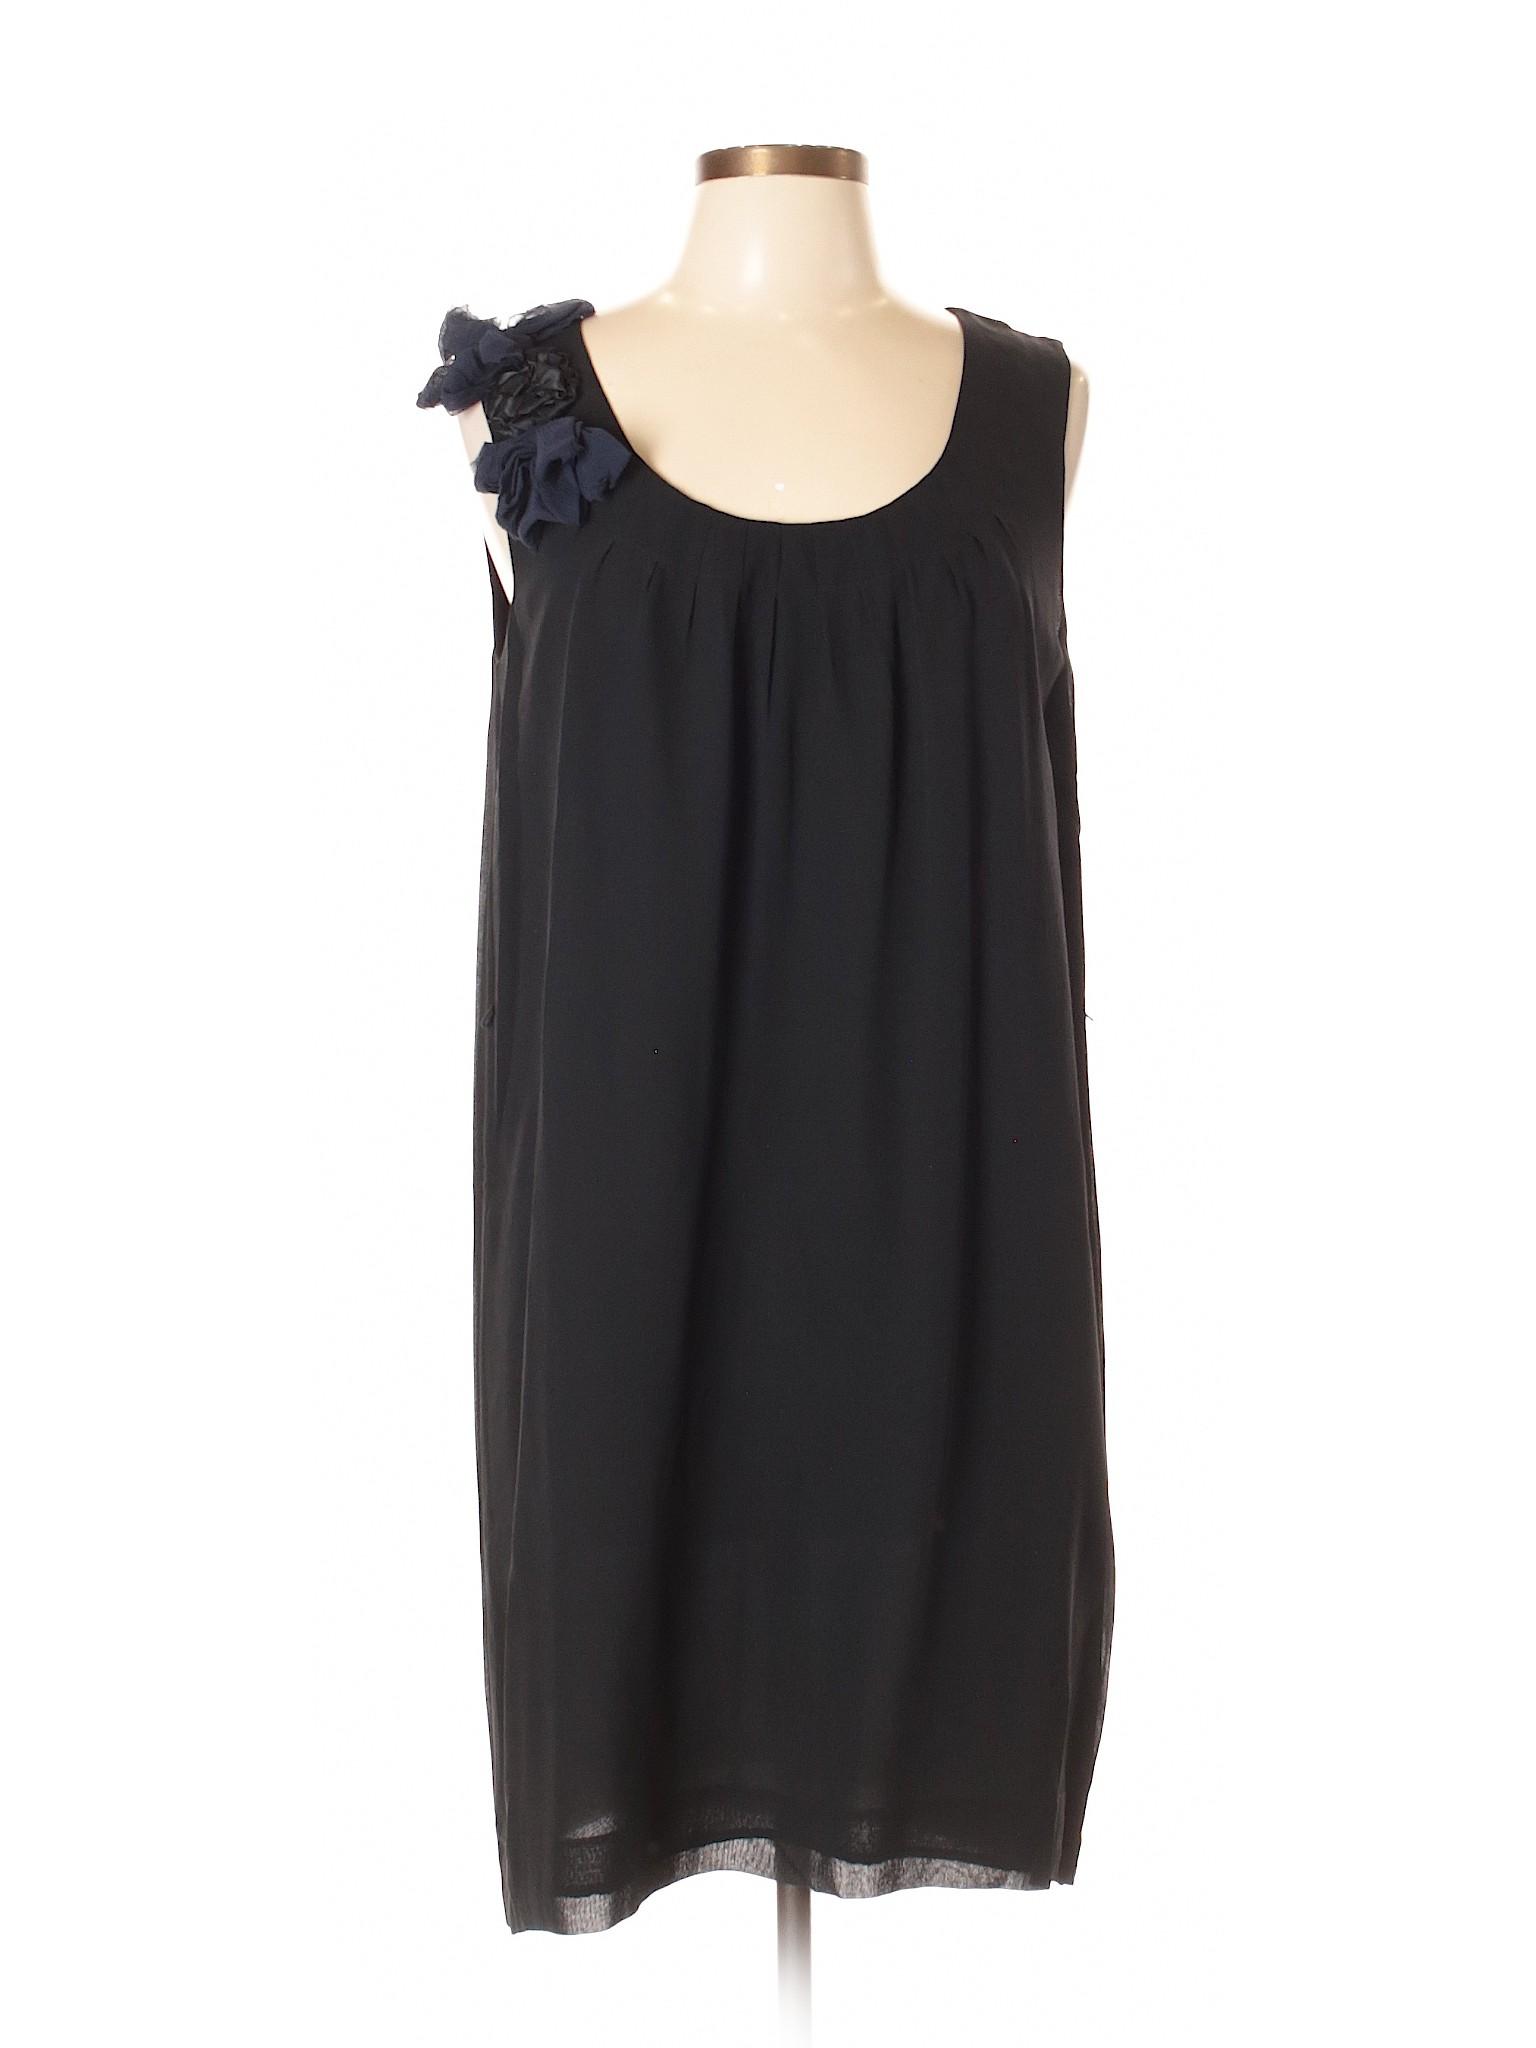 Republic winter Boutique Casual Dress Banana RE1SqP1Uw